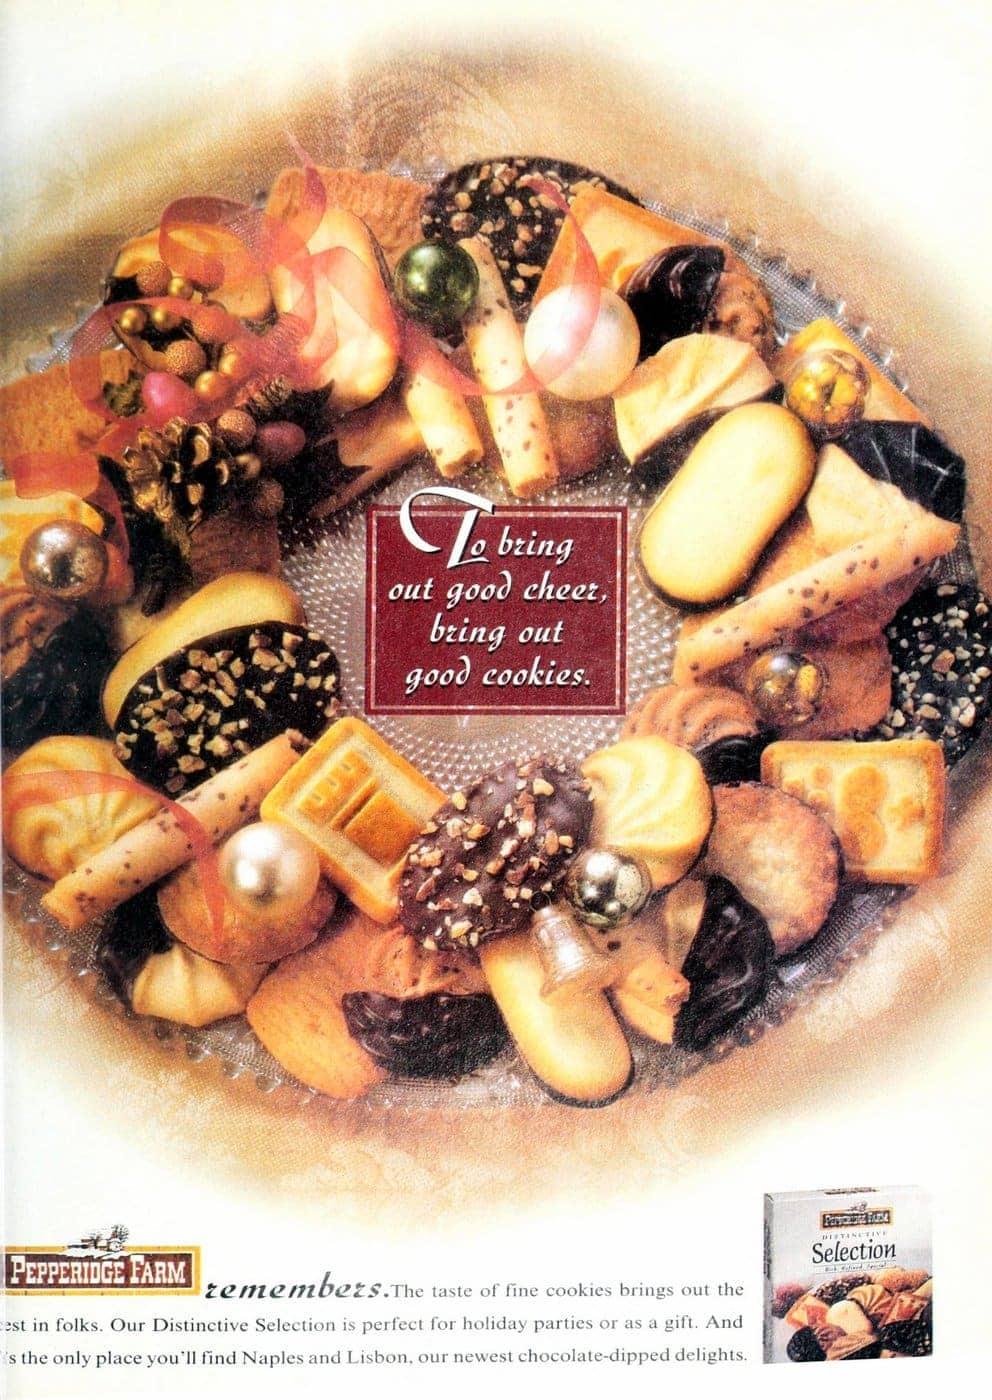 90s Pepperidge Farm cookie selection box (1995)